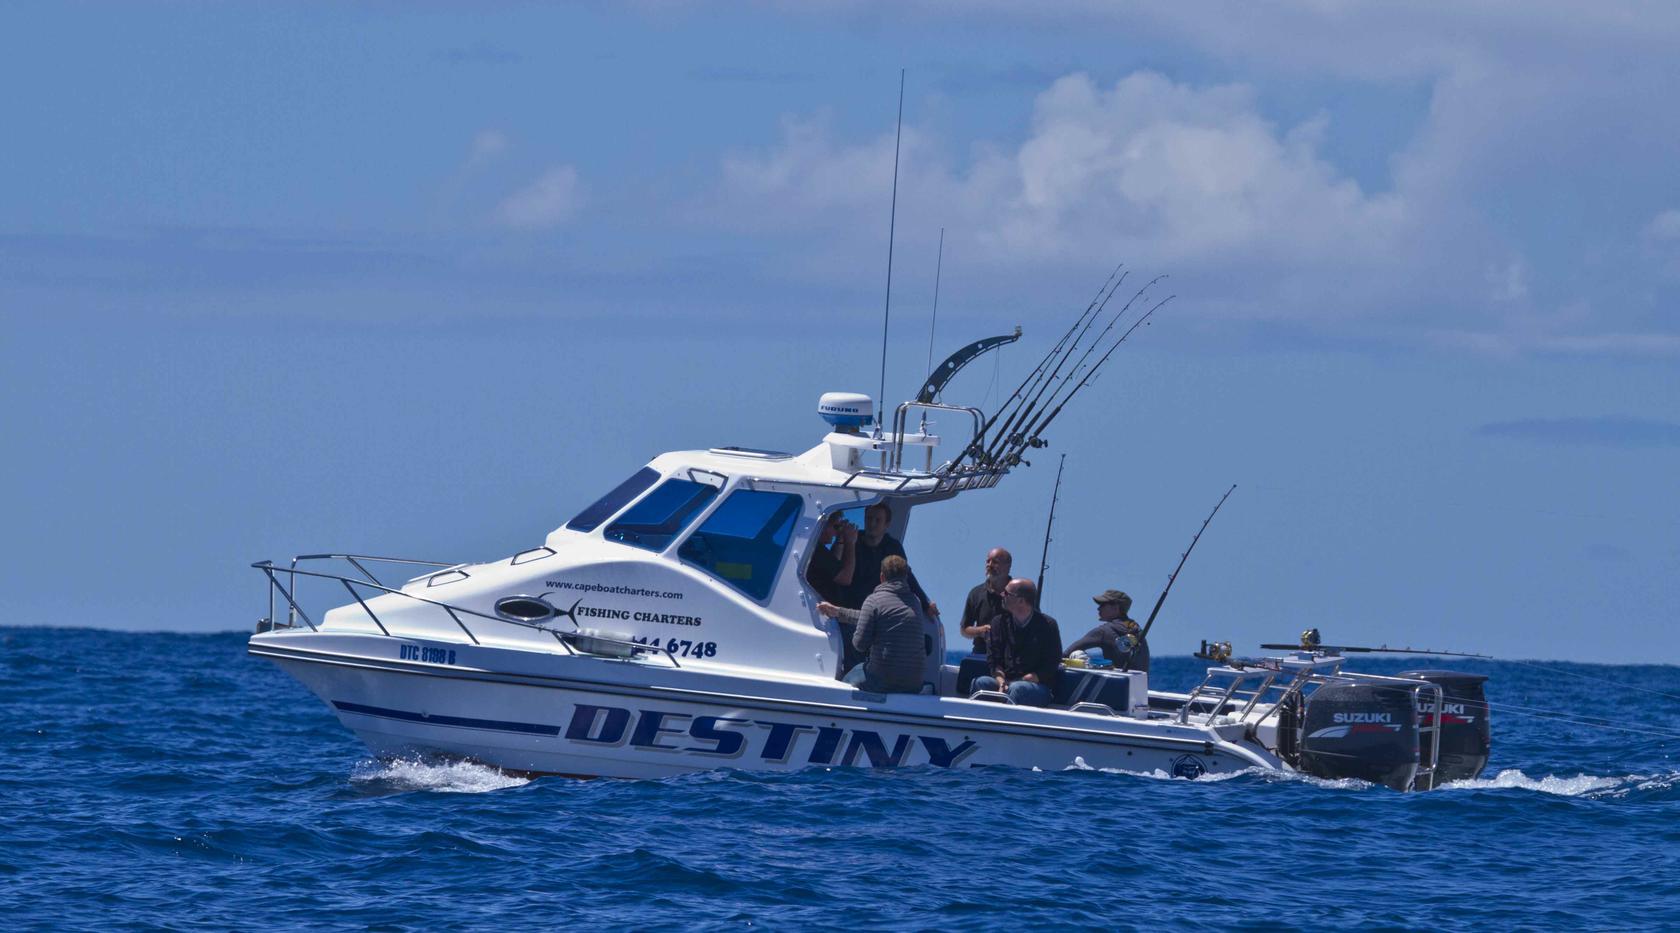 Cape boat charters deep sea tuna fishing scienic eco for Deep sea fishing boats for sale